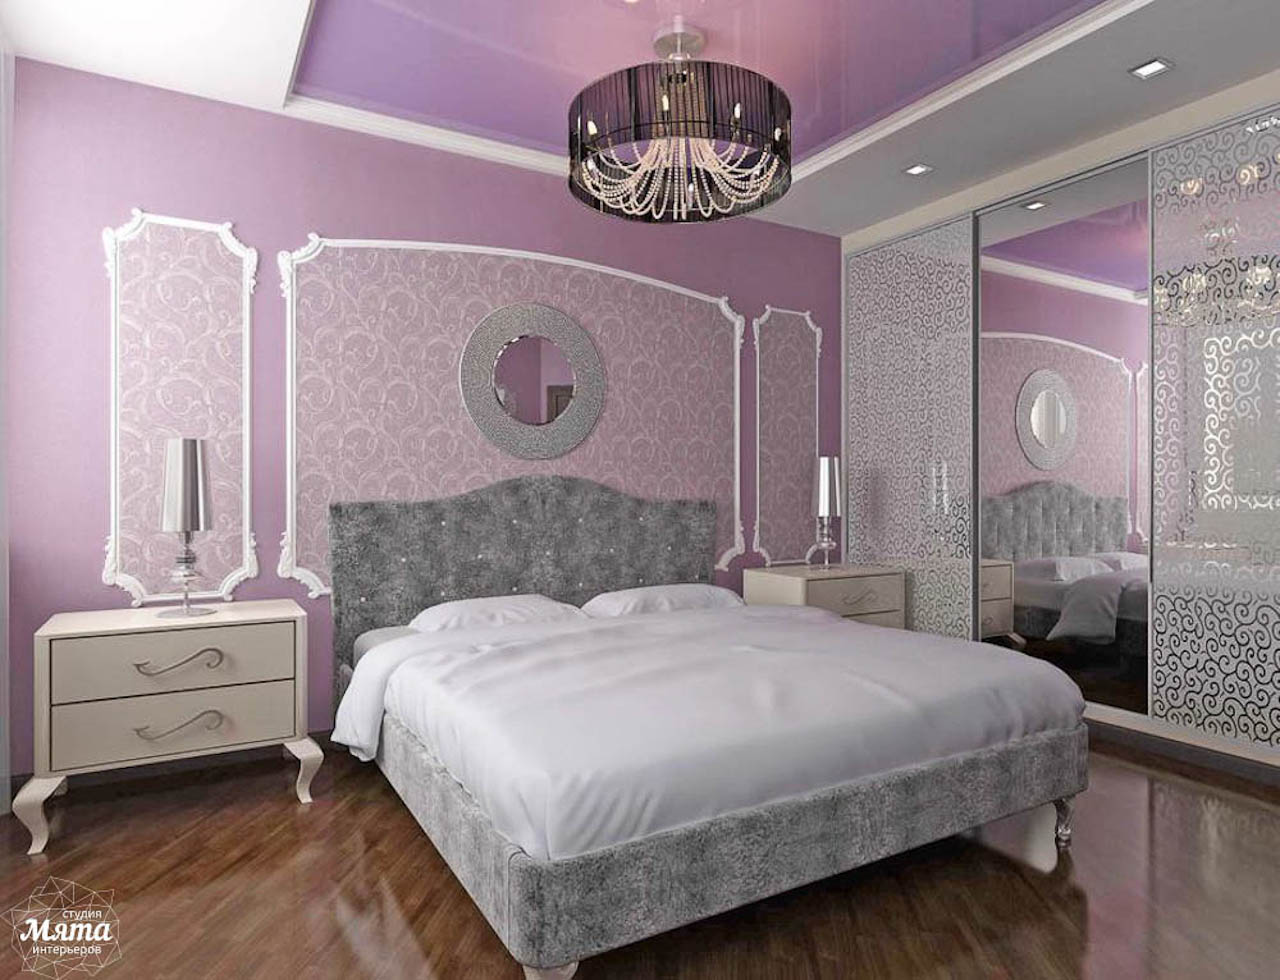 Дизайн интерьера двухкомнатной квартиры по ул. Юмашева 10 img429515001